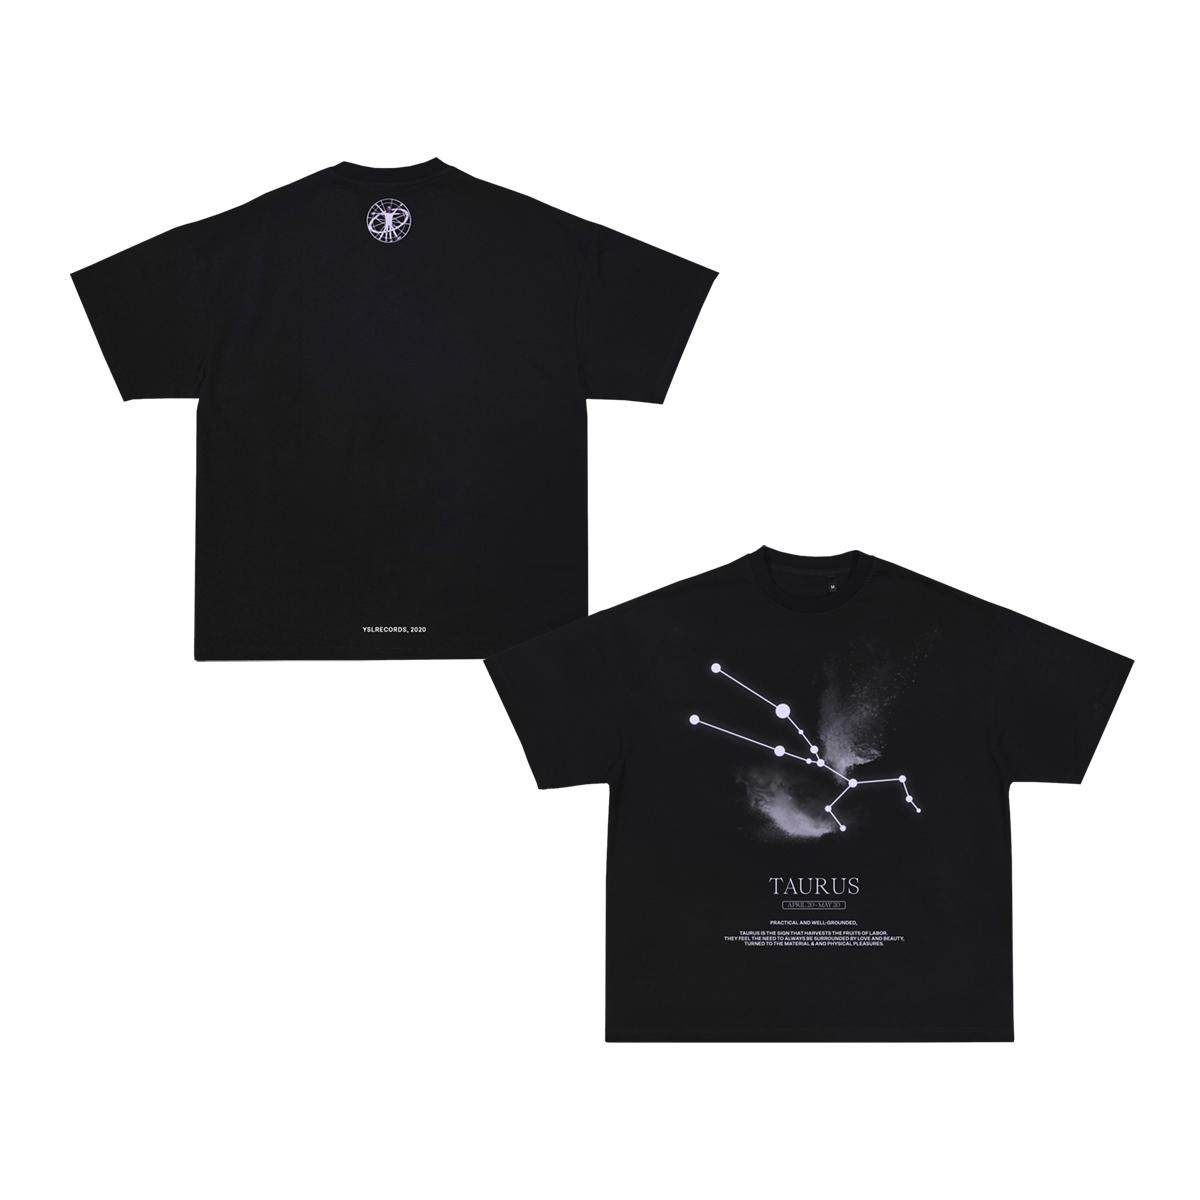 Taurus T-Shirt + Wunna Digital Download